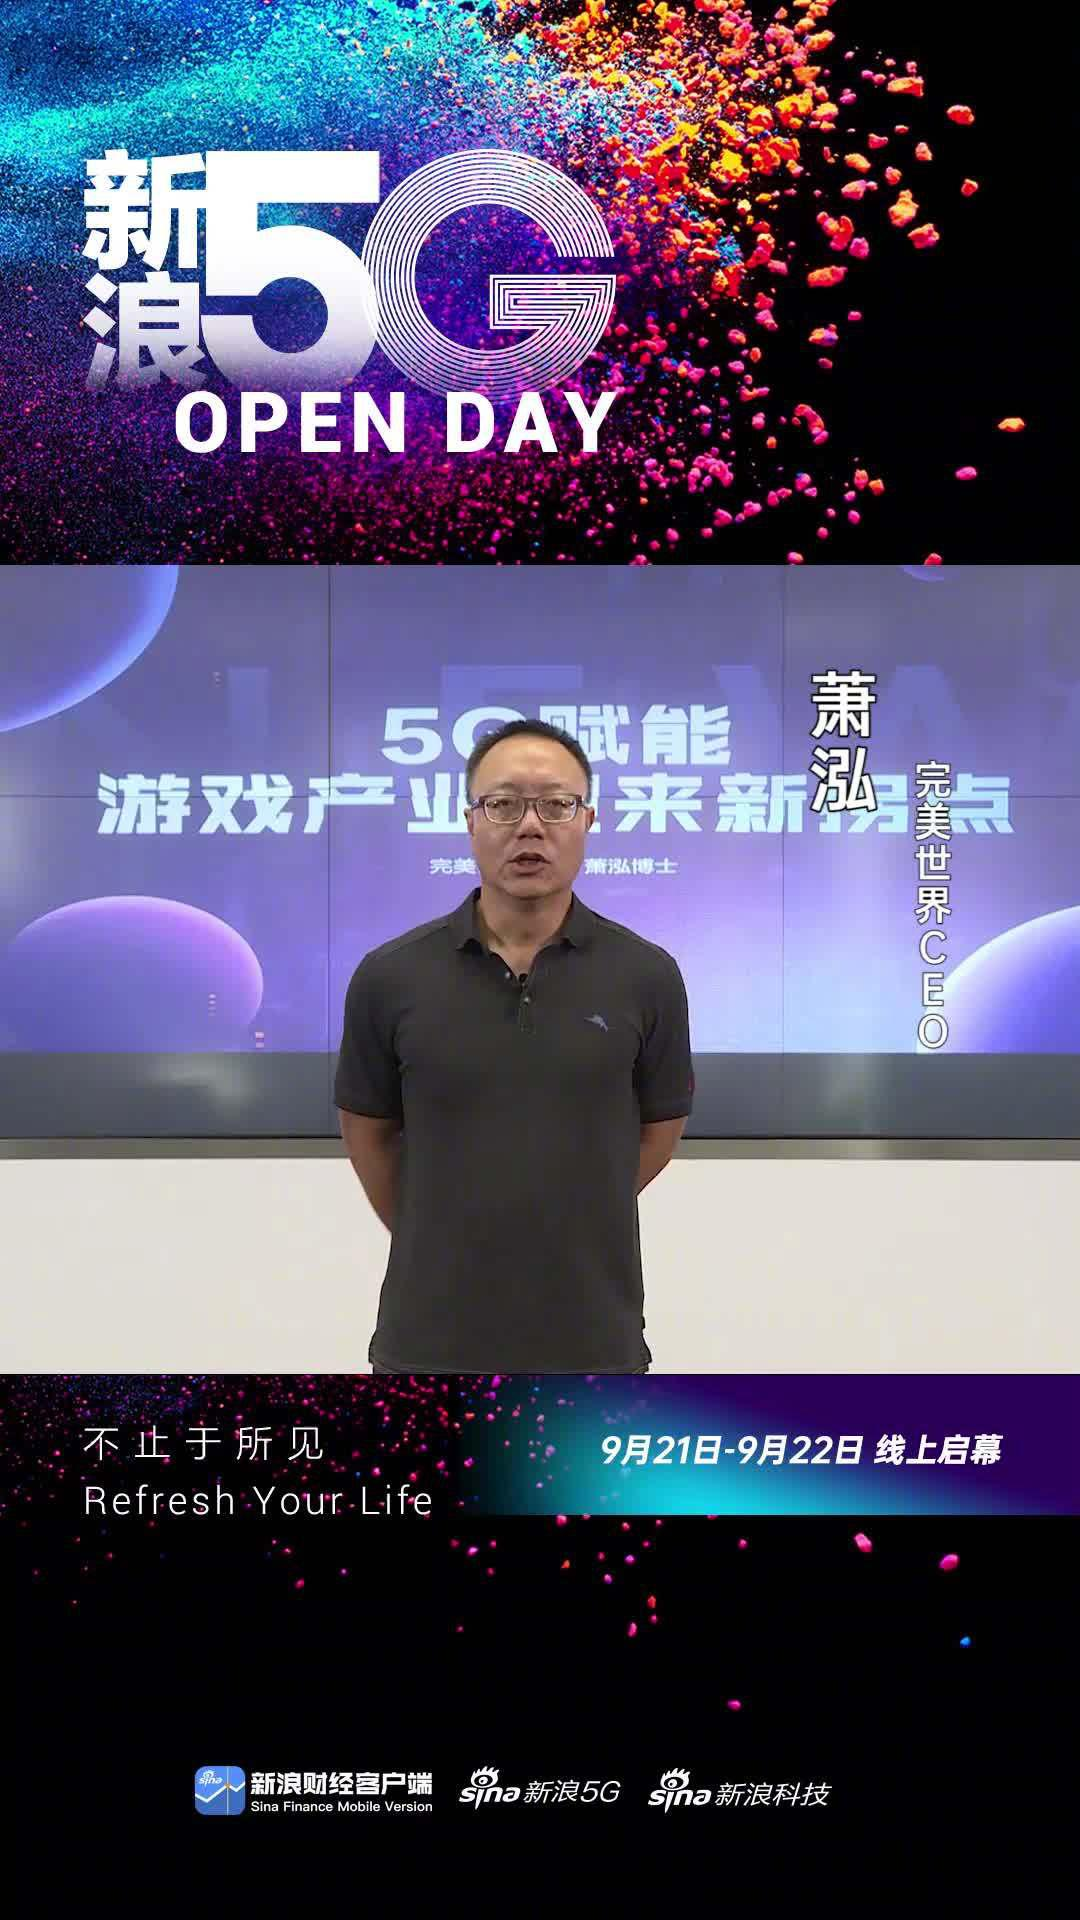 5G赋能,游戏产业迎来新拐点!@完美世界 CEO萧泓邀您共同关注!